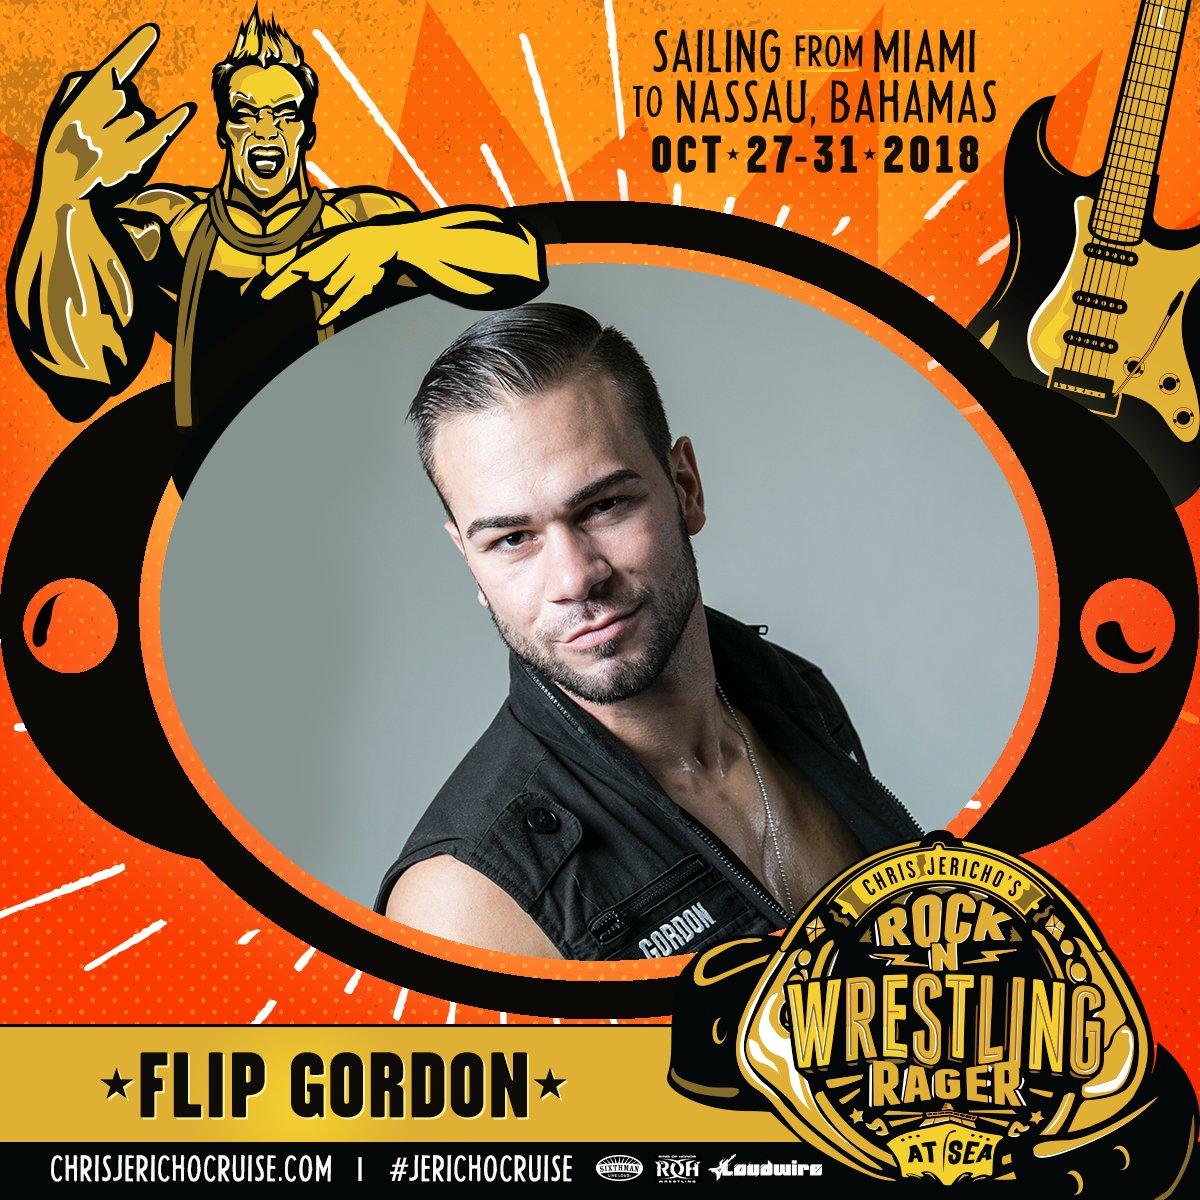 Roh Wrestling On Twitter Theflipgordon Joins The Jerichocruise